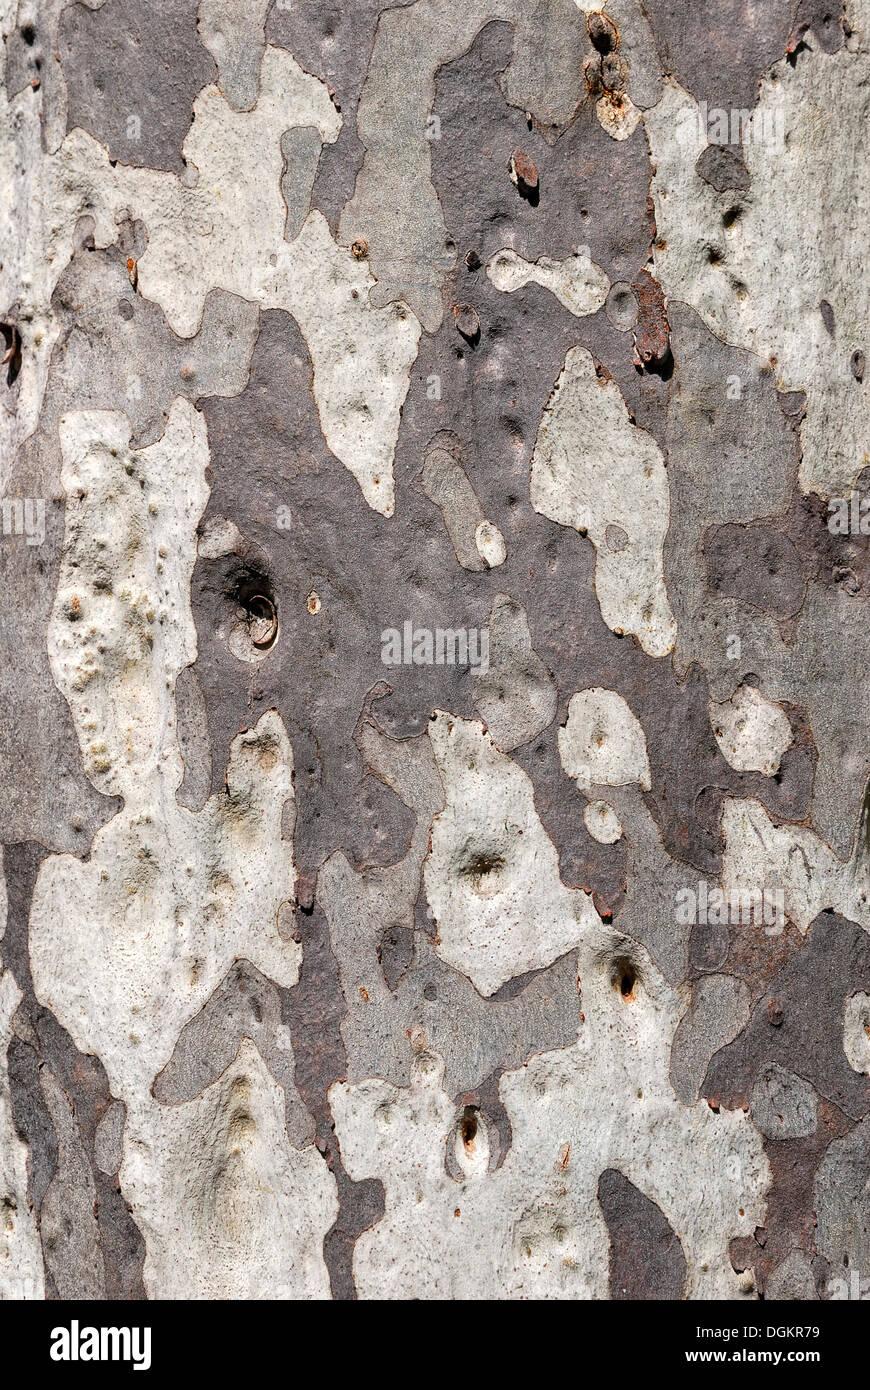 Eucalyptus bark (Eucalyptus), Carnarvon Gorge National Park, Queensland, Australia - Stock Image